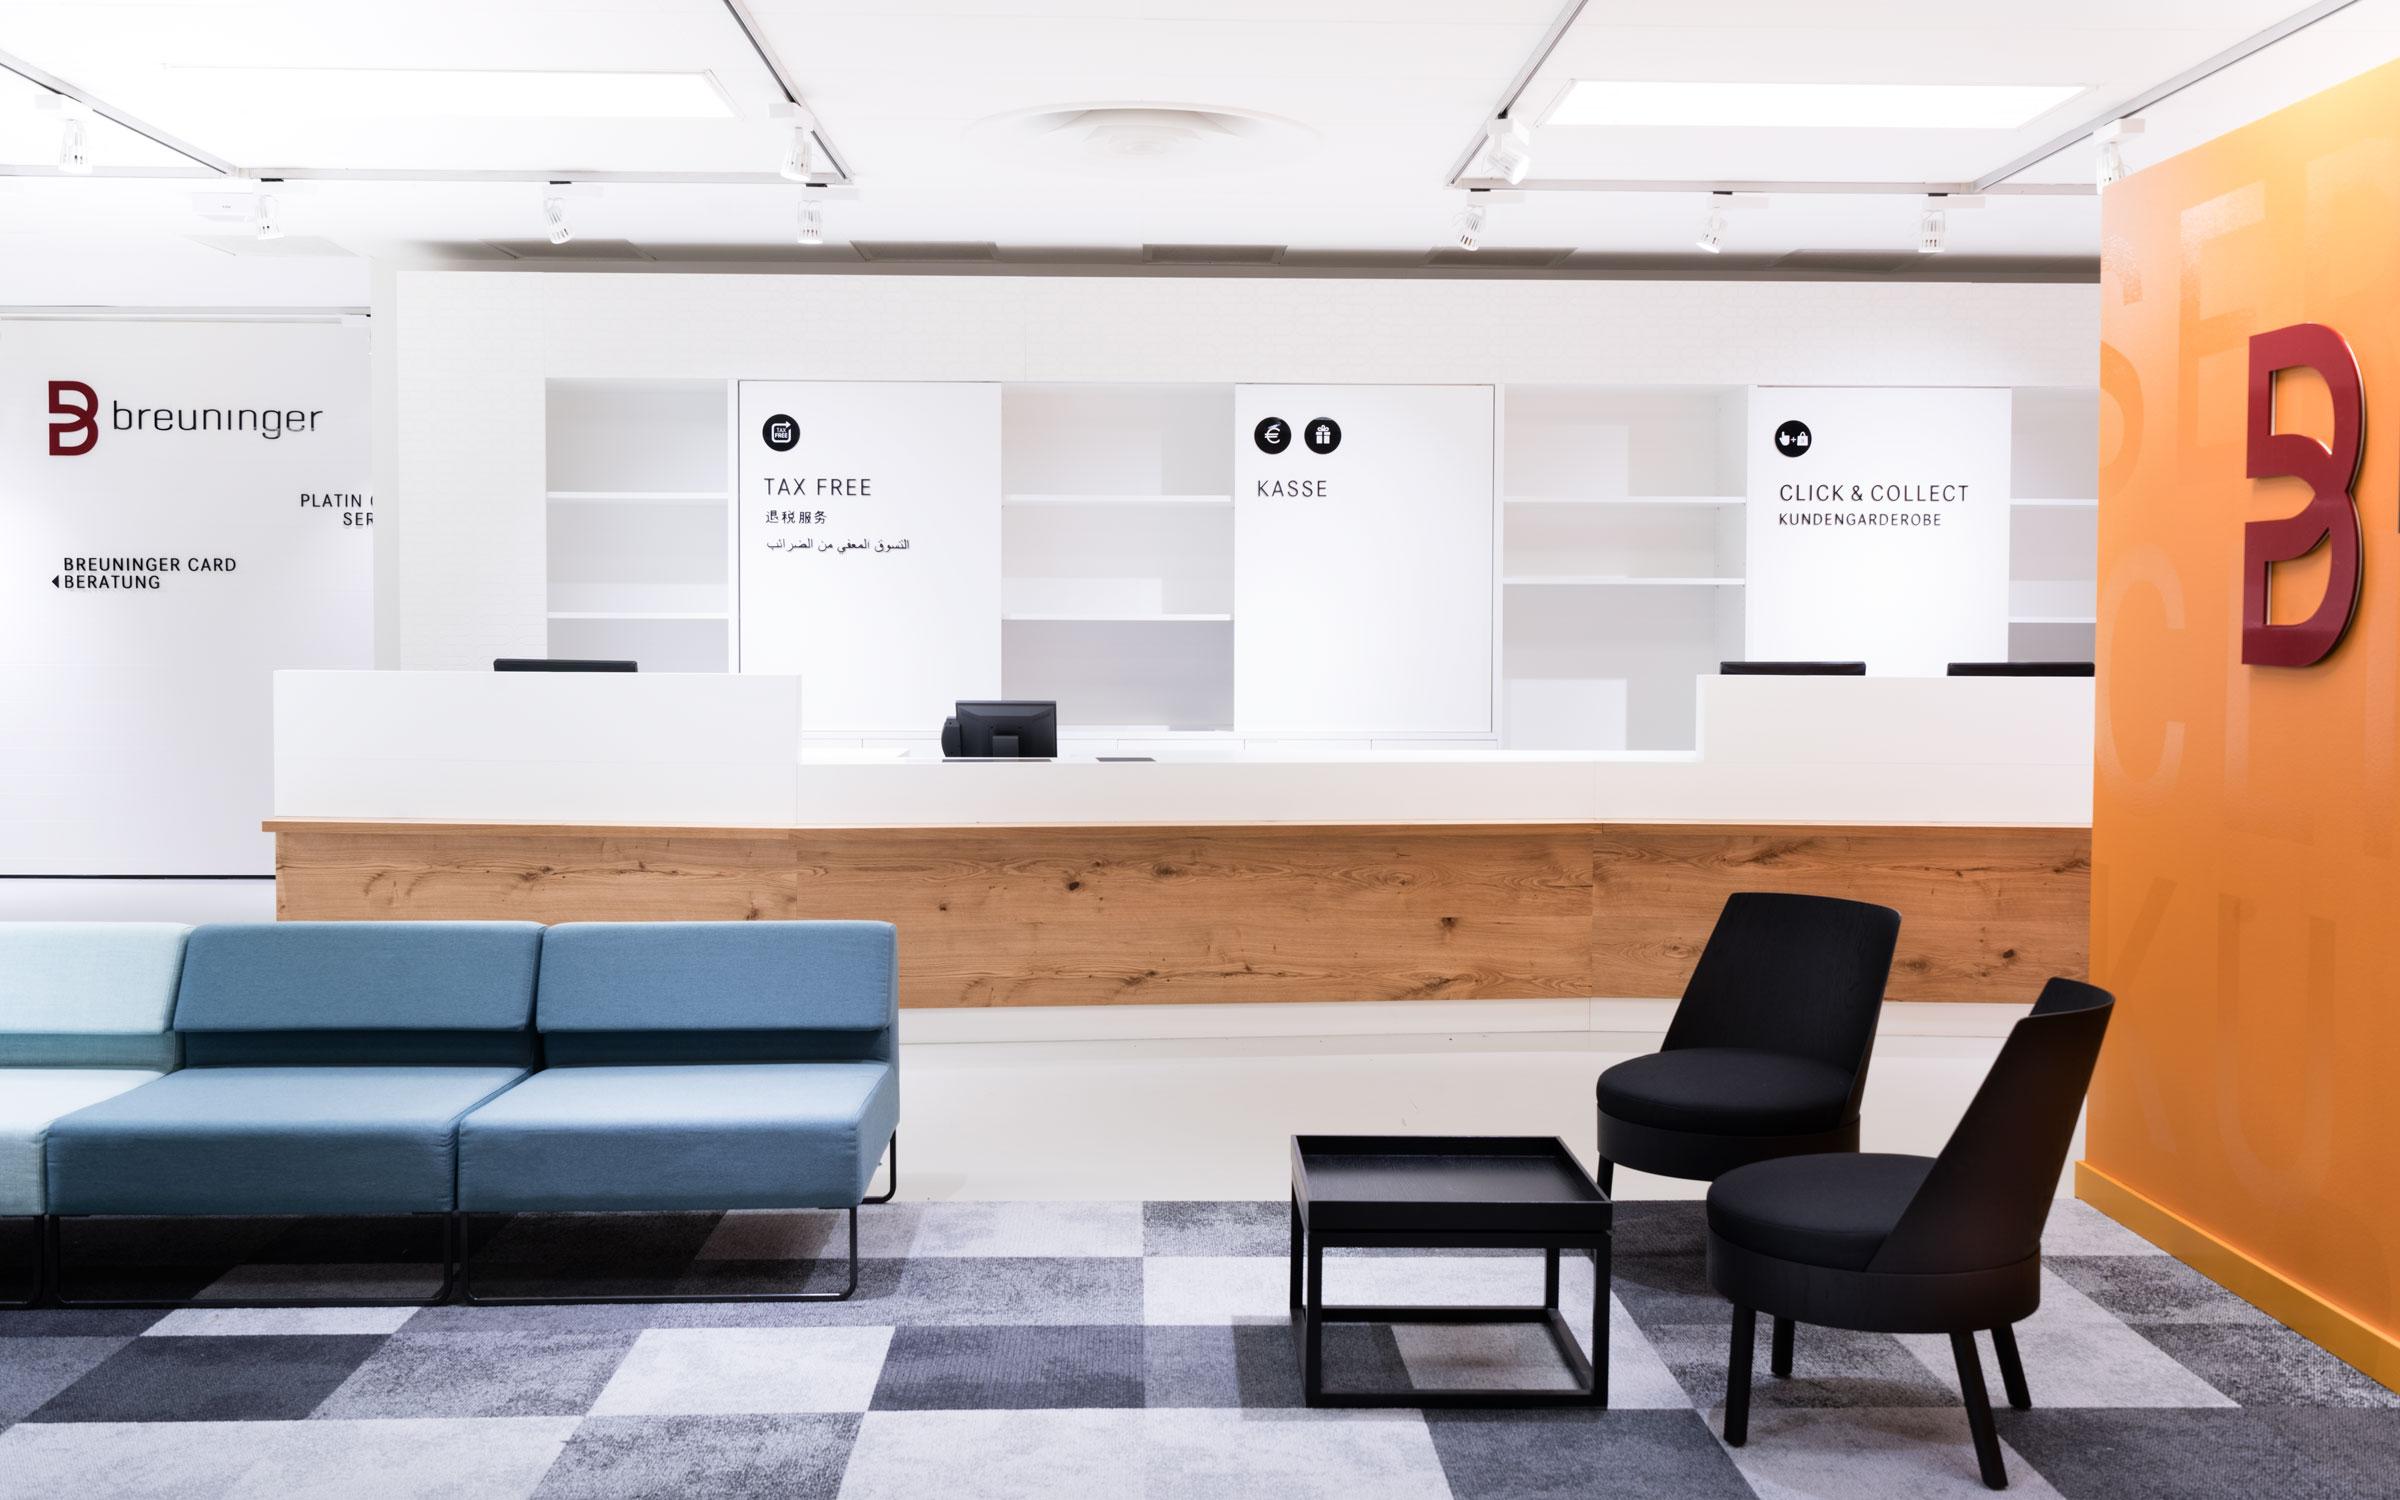 DI-A - Breuninger Kundenzentrum